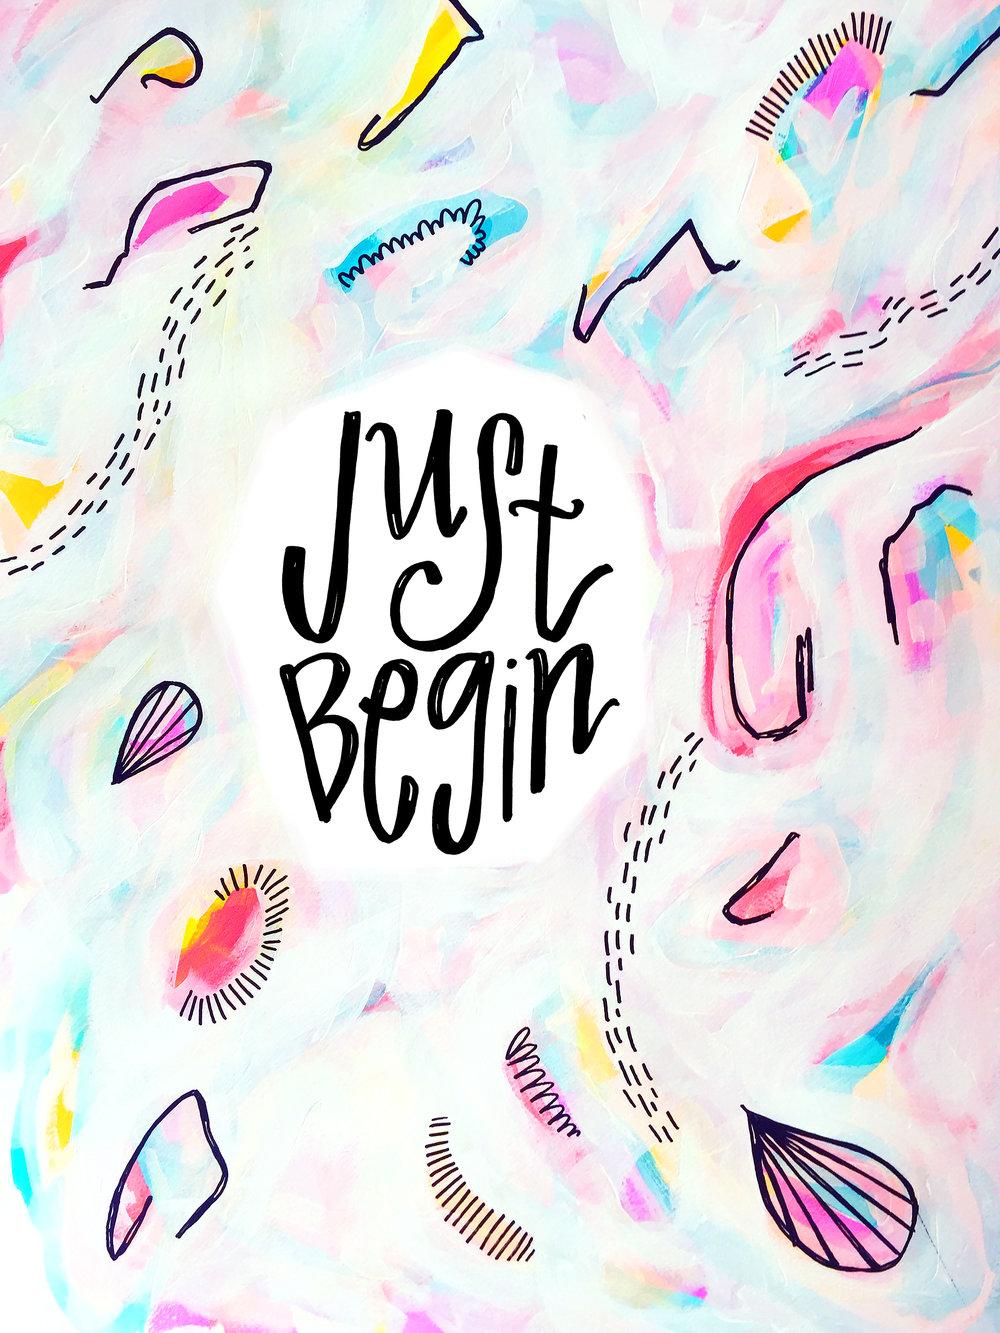 1/1/16: Begin